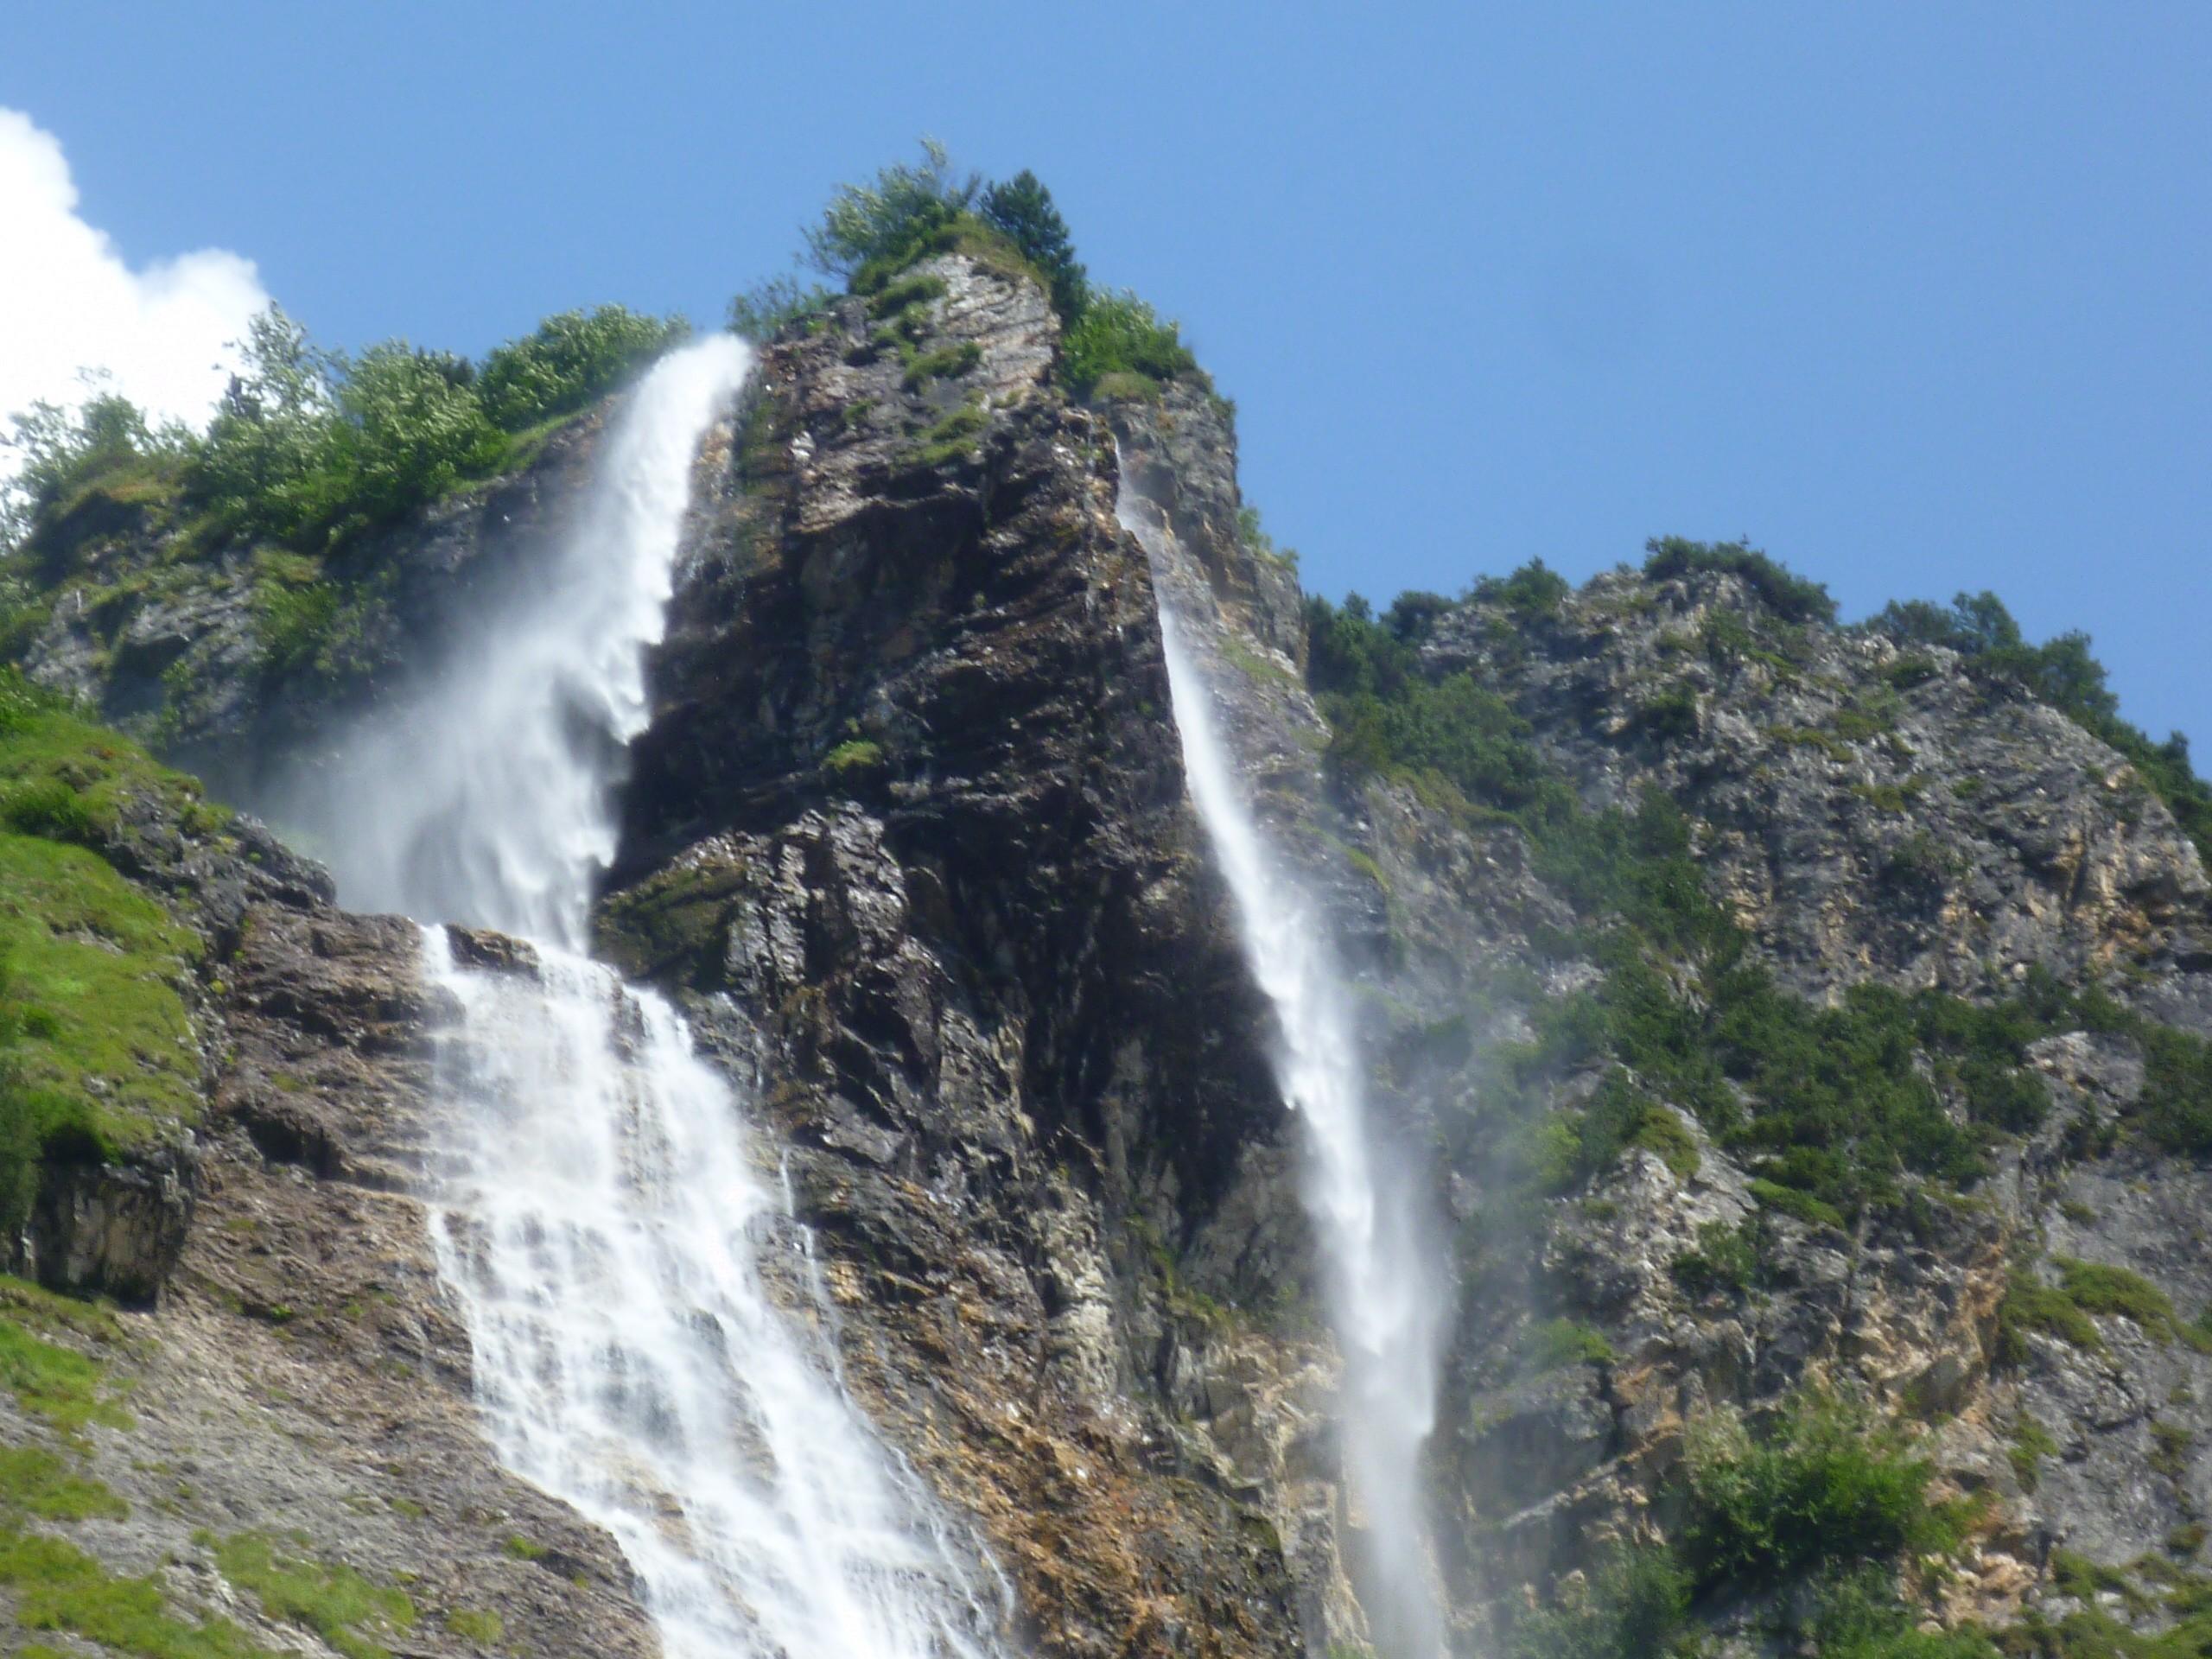 Cascade de la Vuzelle - Planay